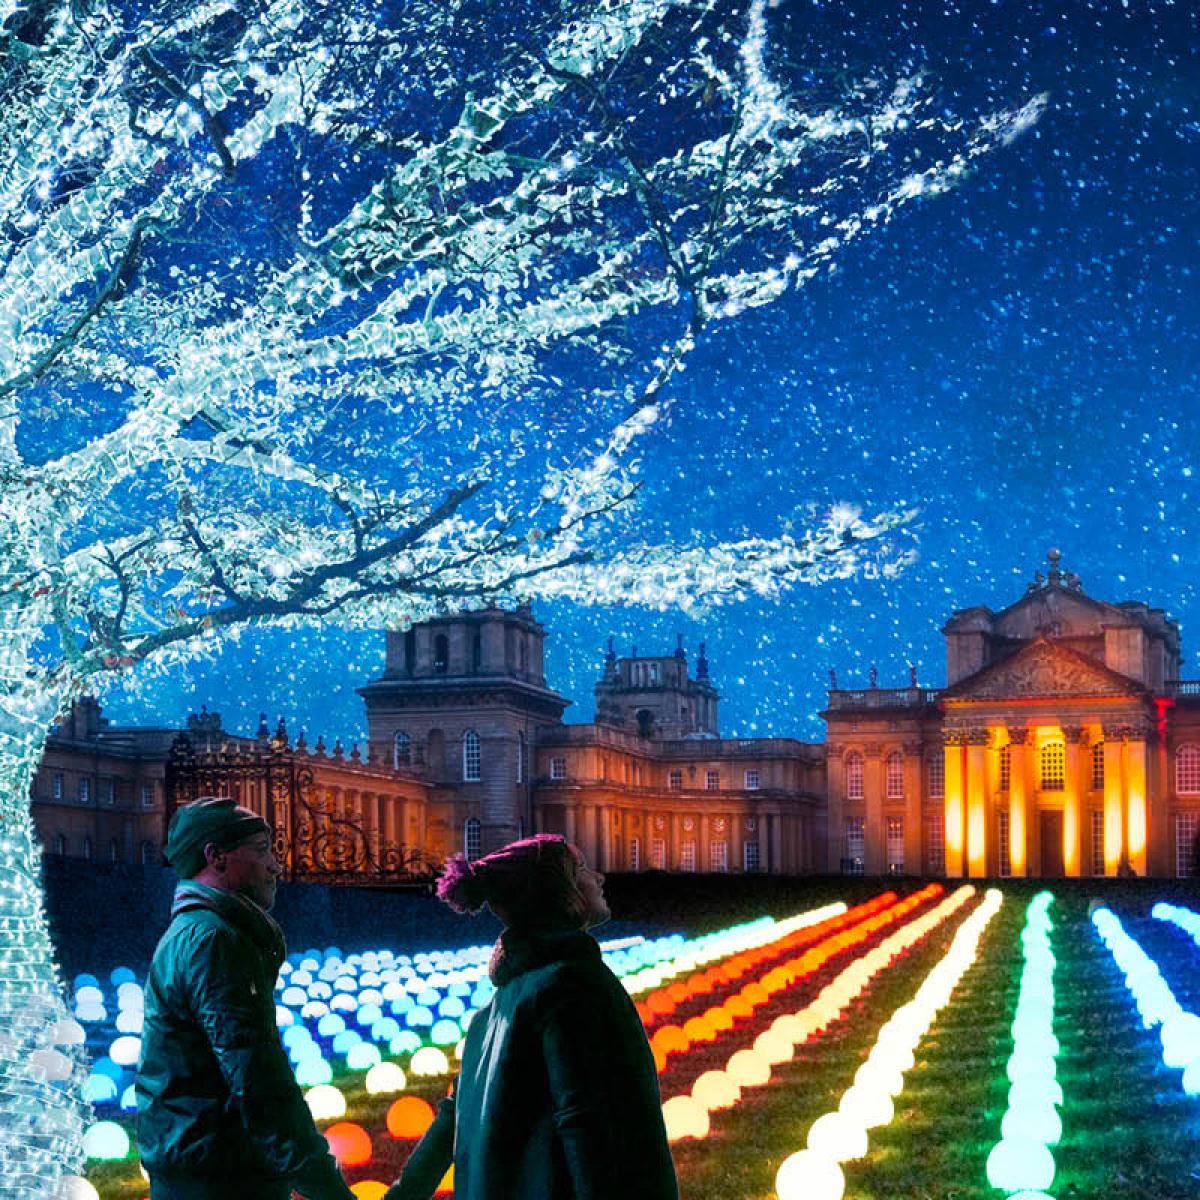 Blenheim Palace Illuminated Light Trail 2020 - Slider Image 1